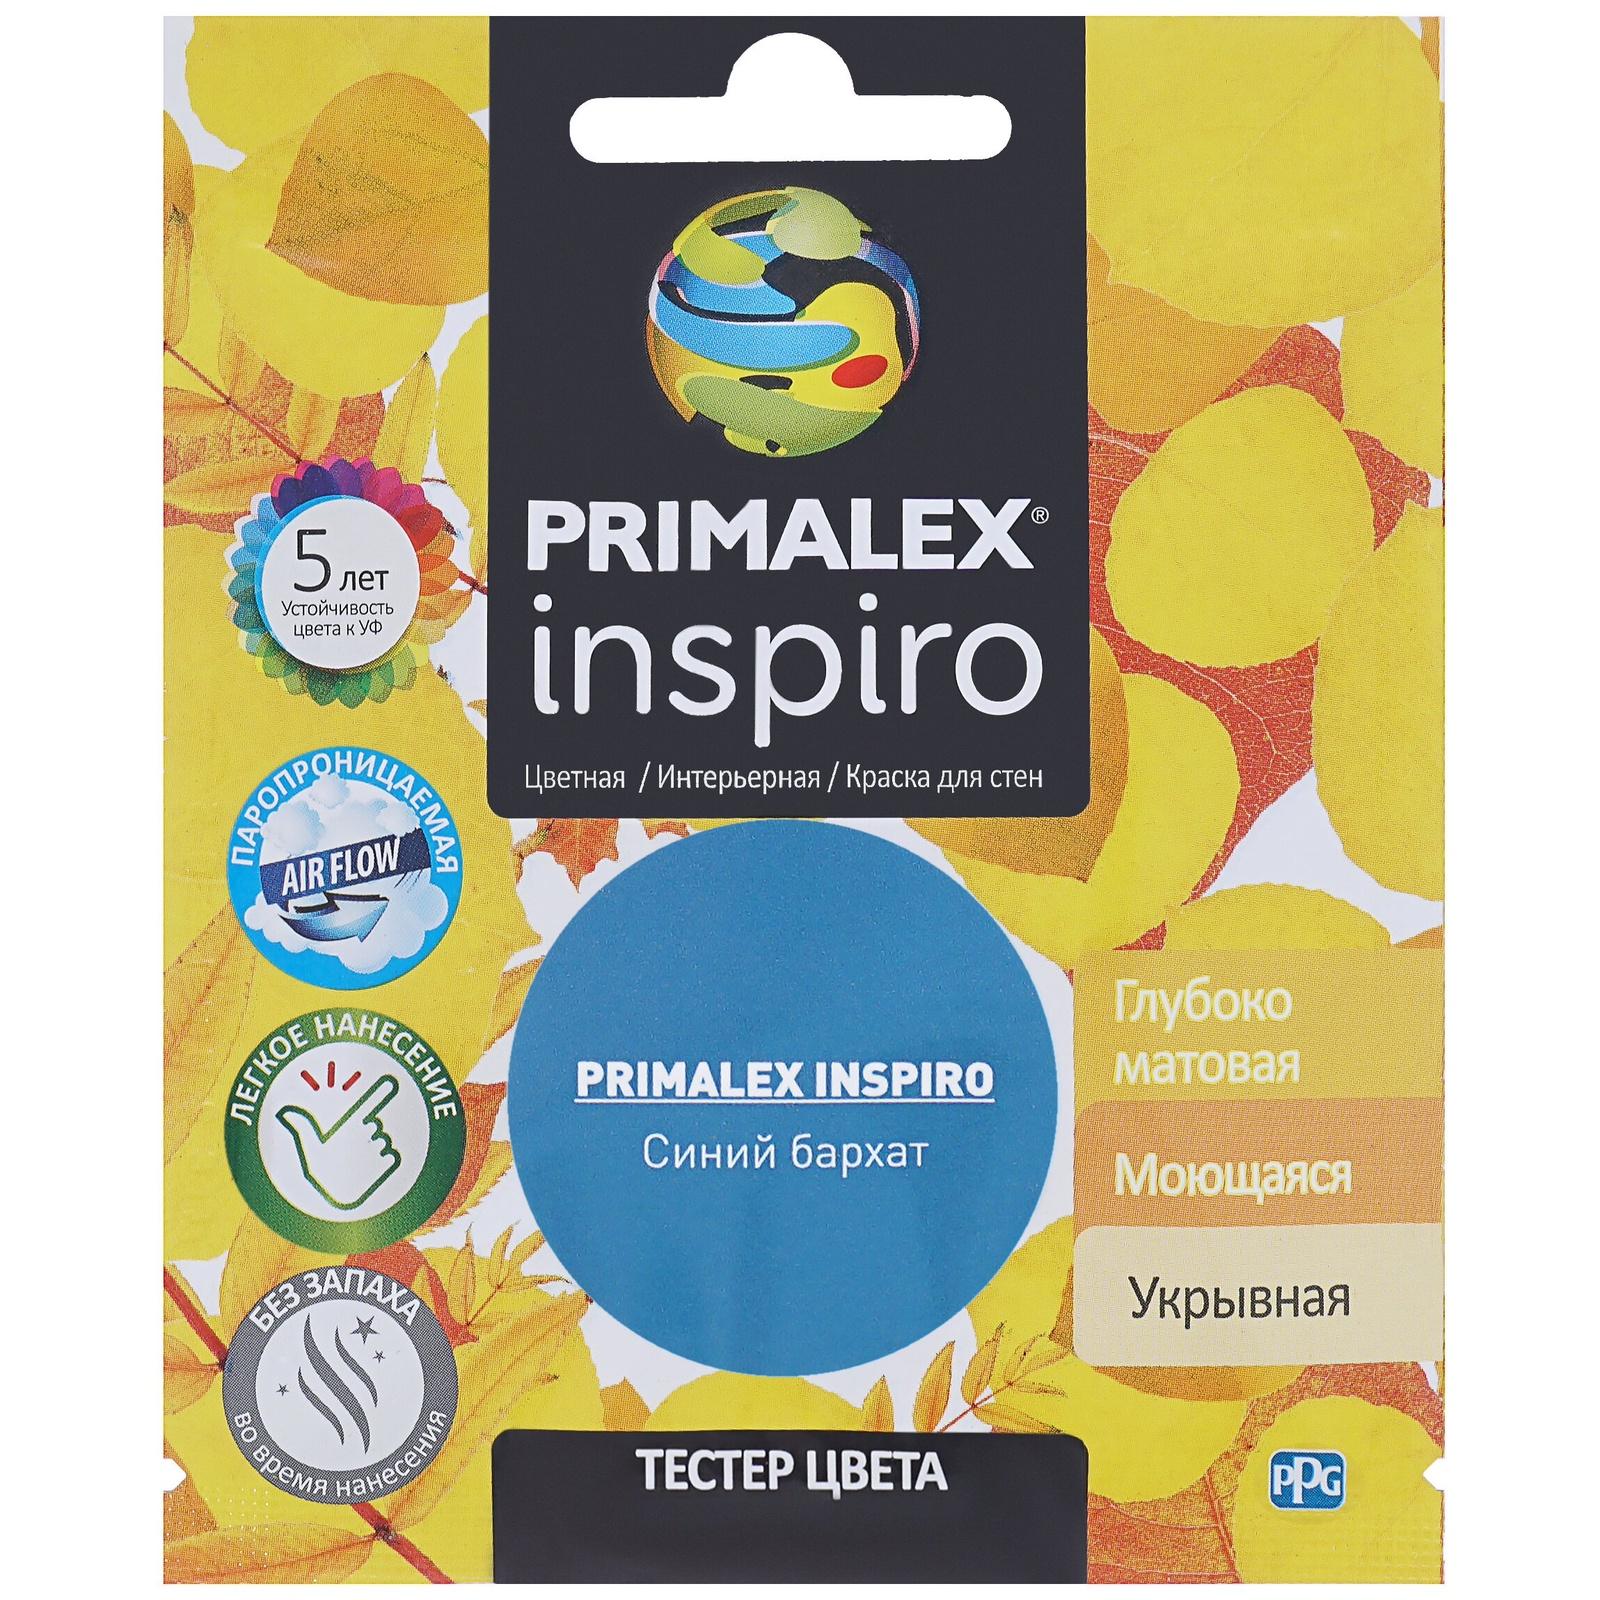 Краска PPG Primalex Inspiro Синий бархат 40мл краска ppg primalex inspiro красный мак 40мл pmx i47